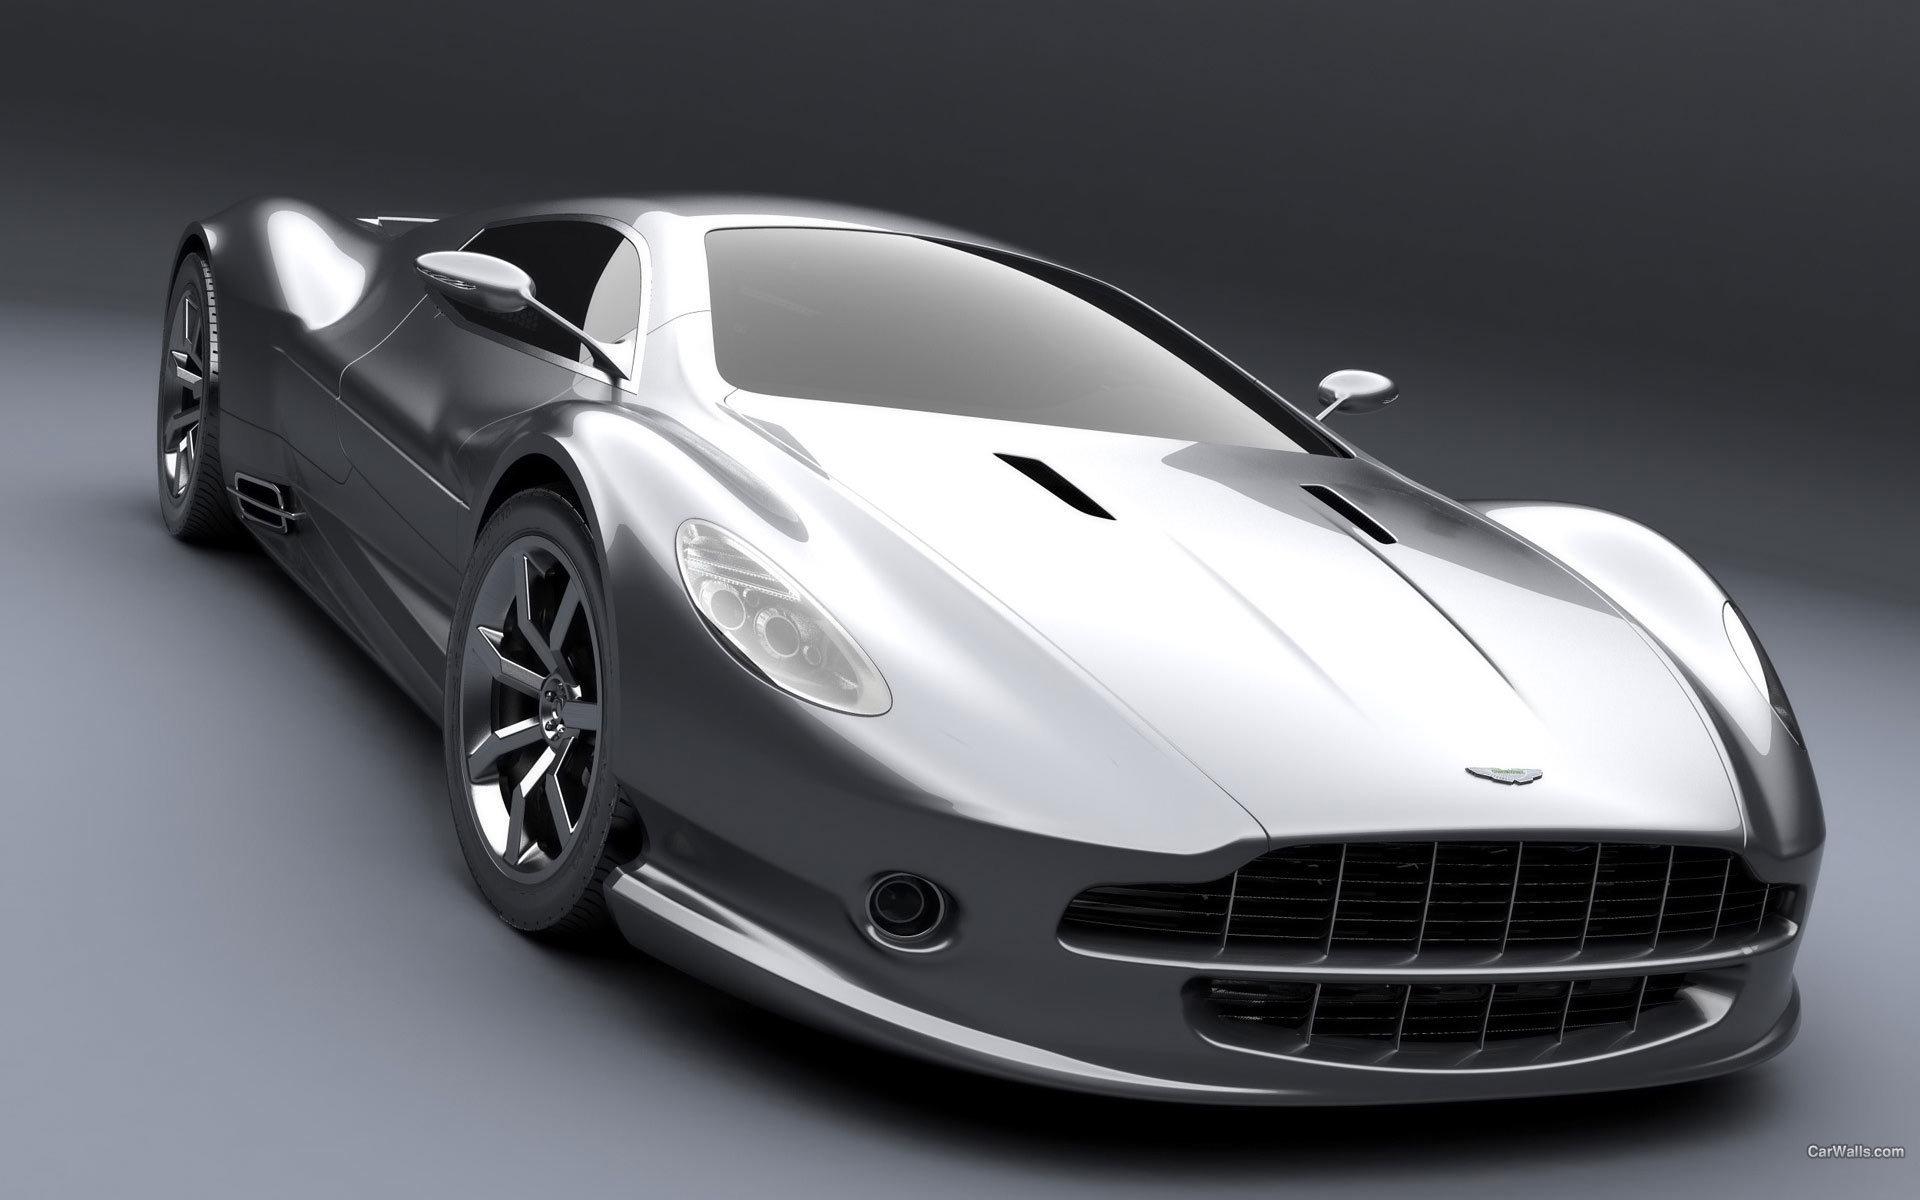 Aston Martin Images Aston Martin Amv10 Hd Wallpaper And